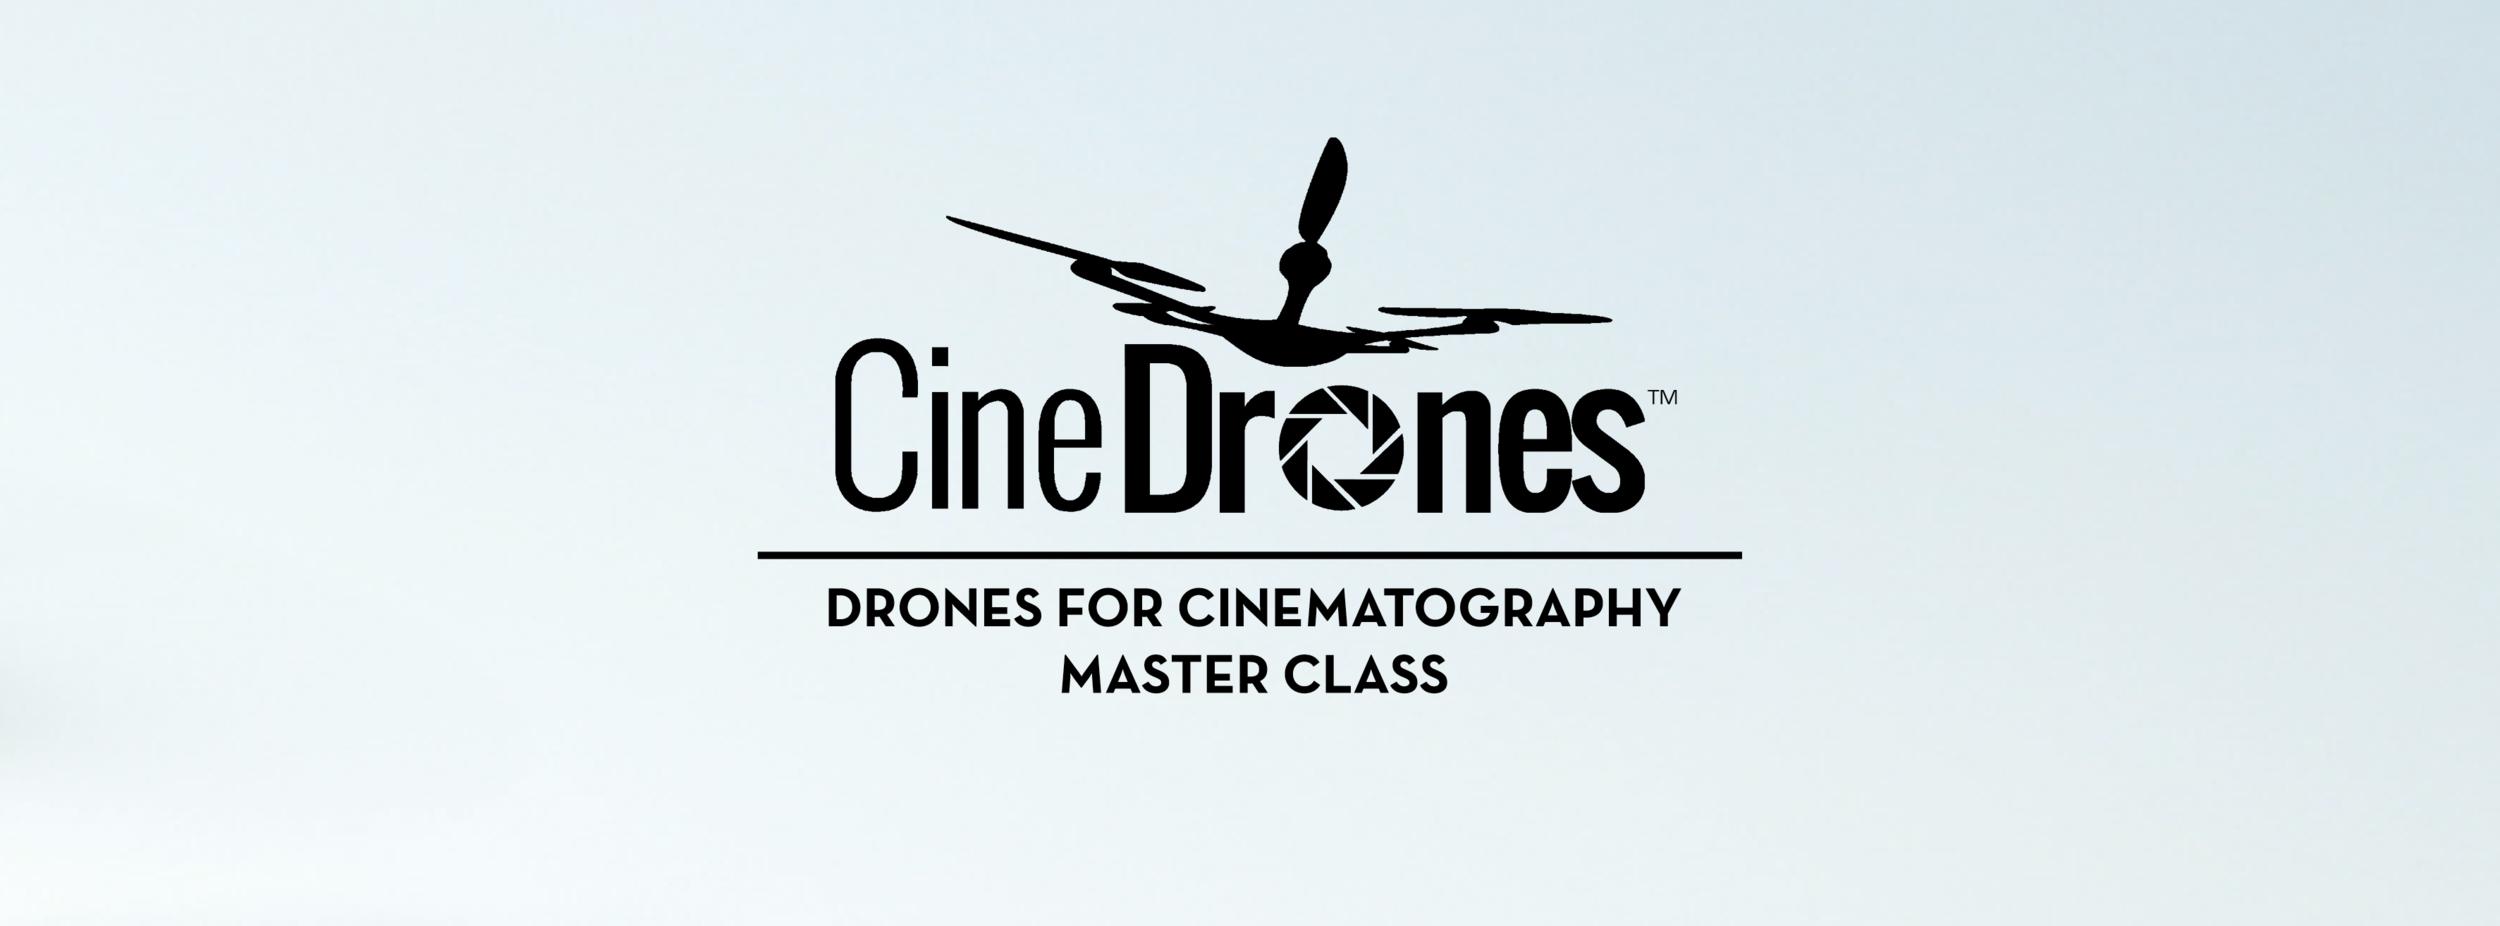 ATLFS-CineDrone Masterclass.png